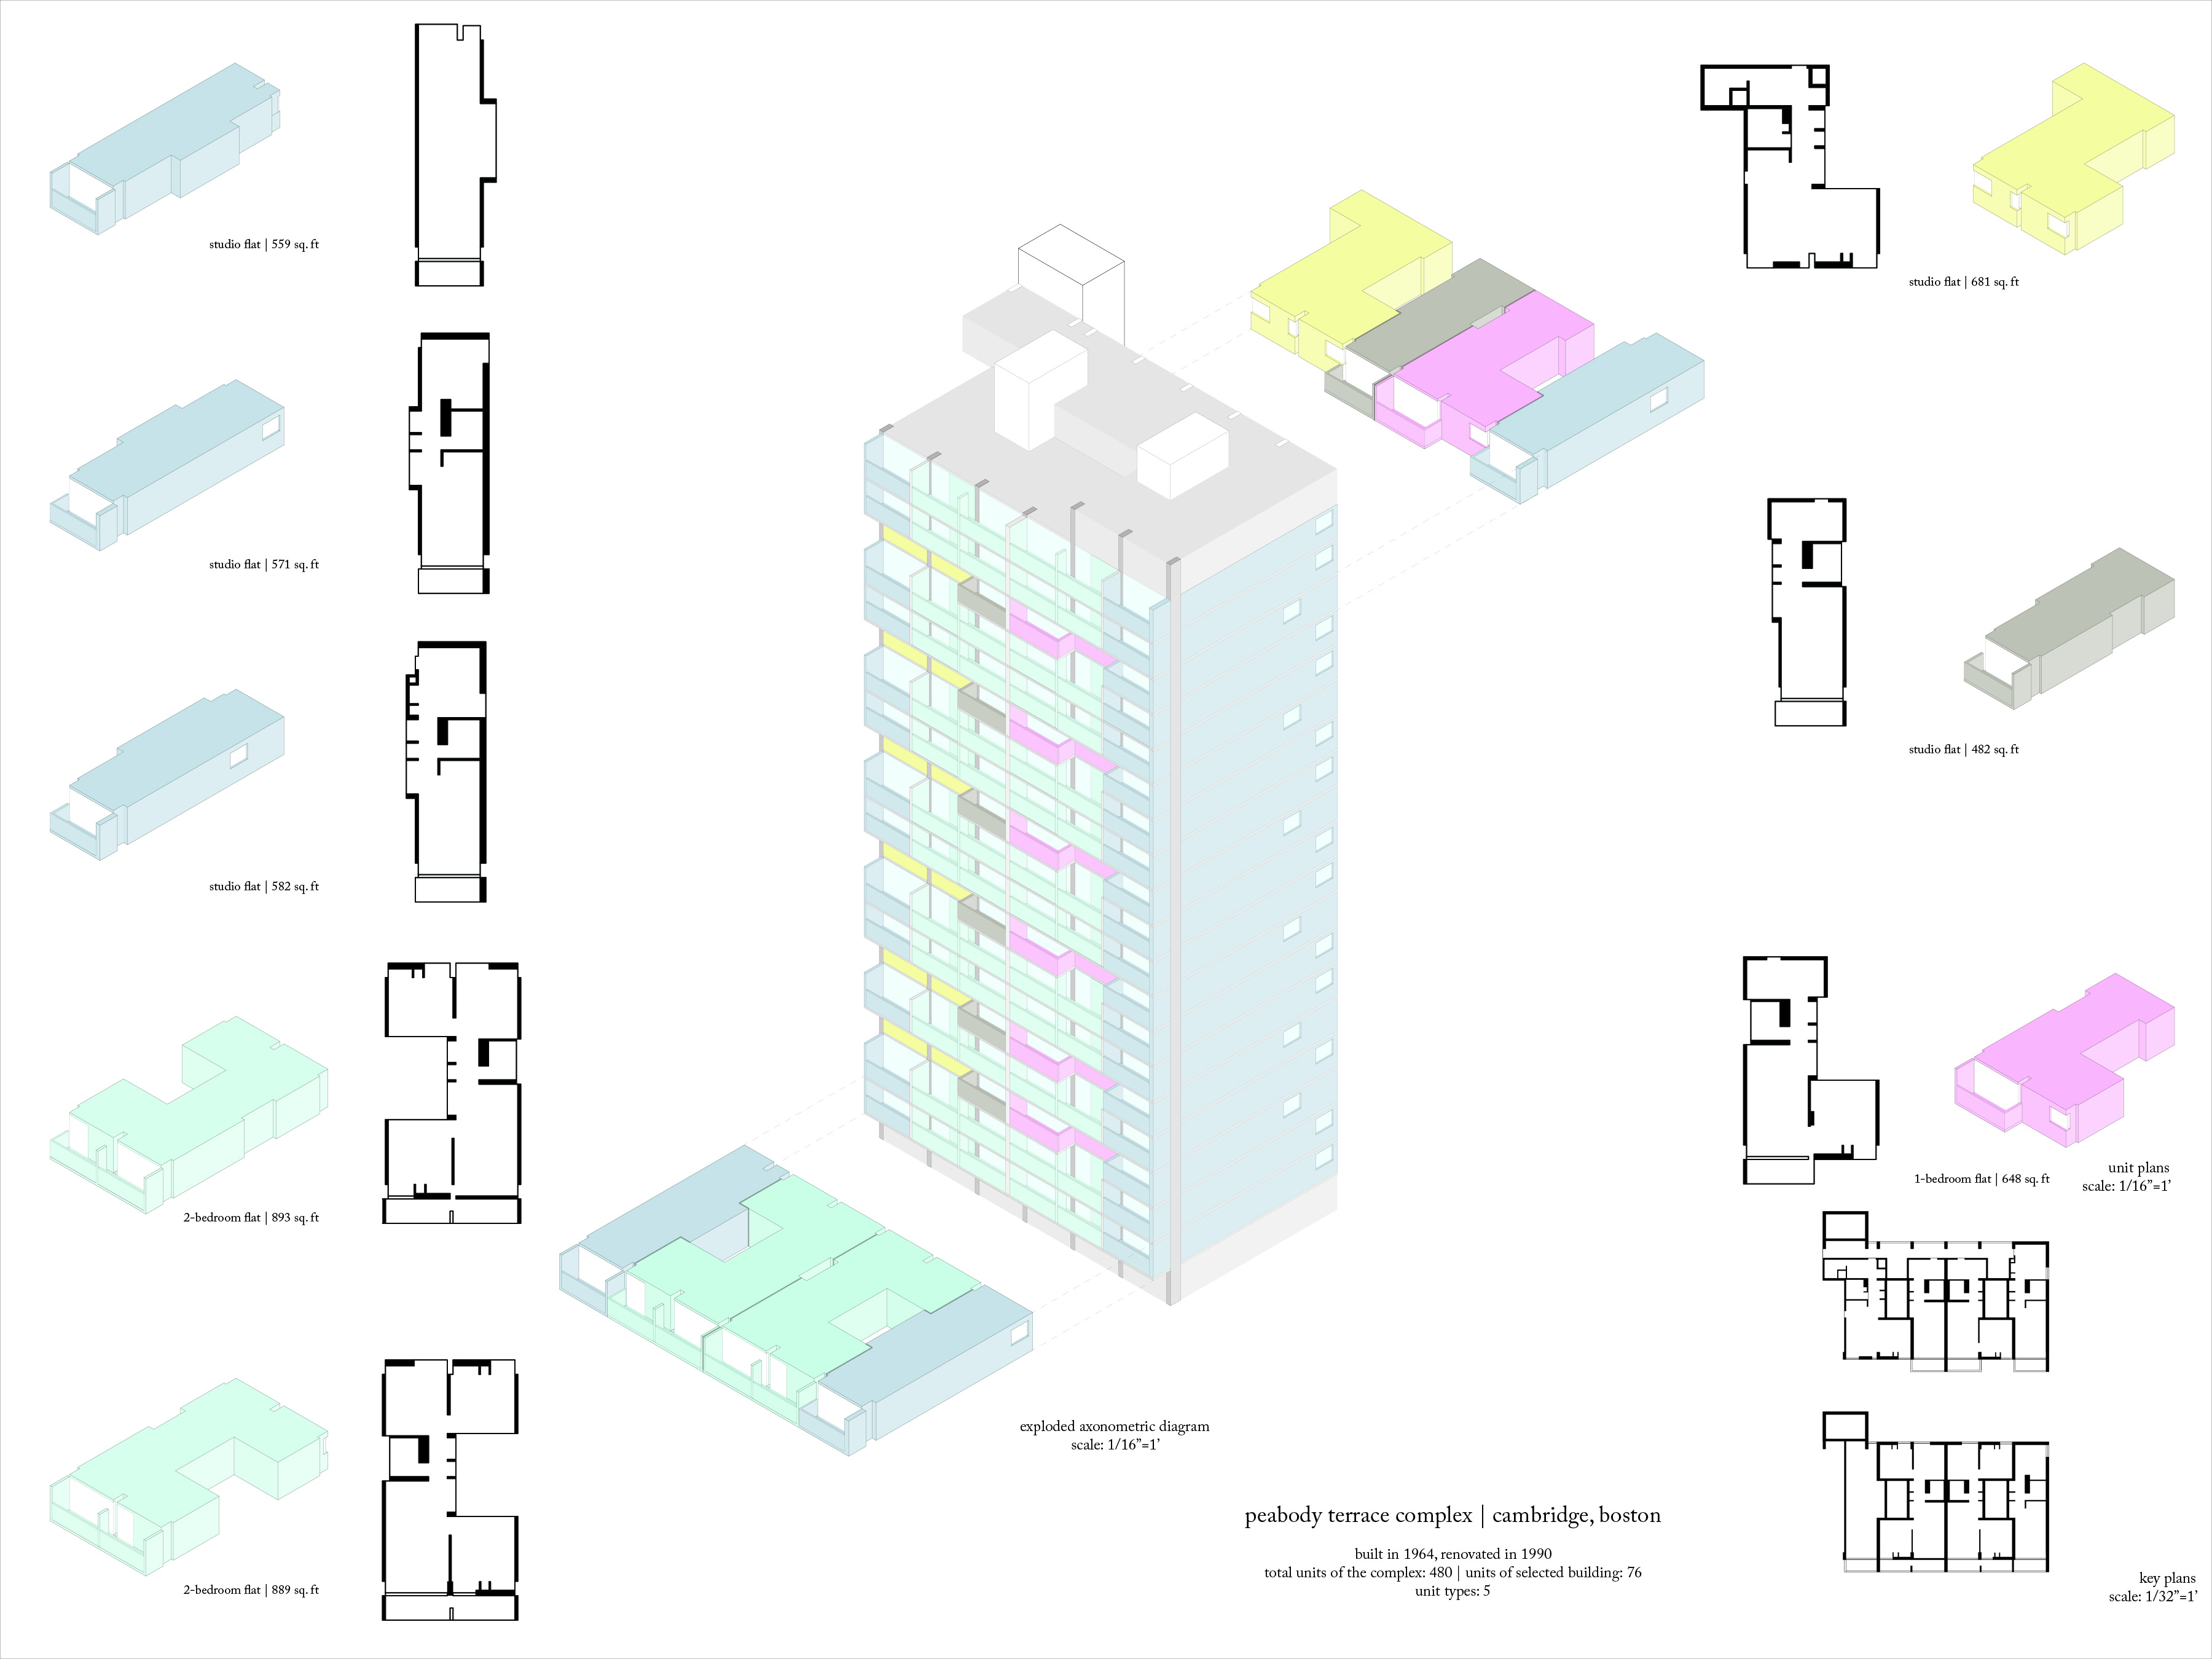 Peabody Terrace Analysis